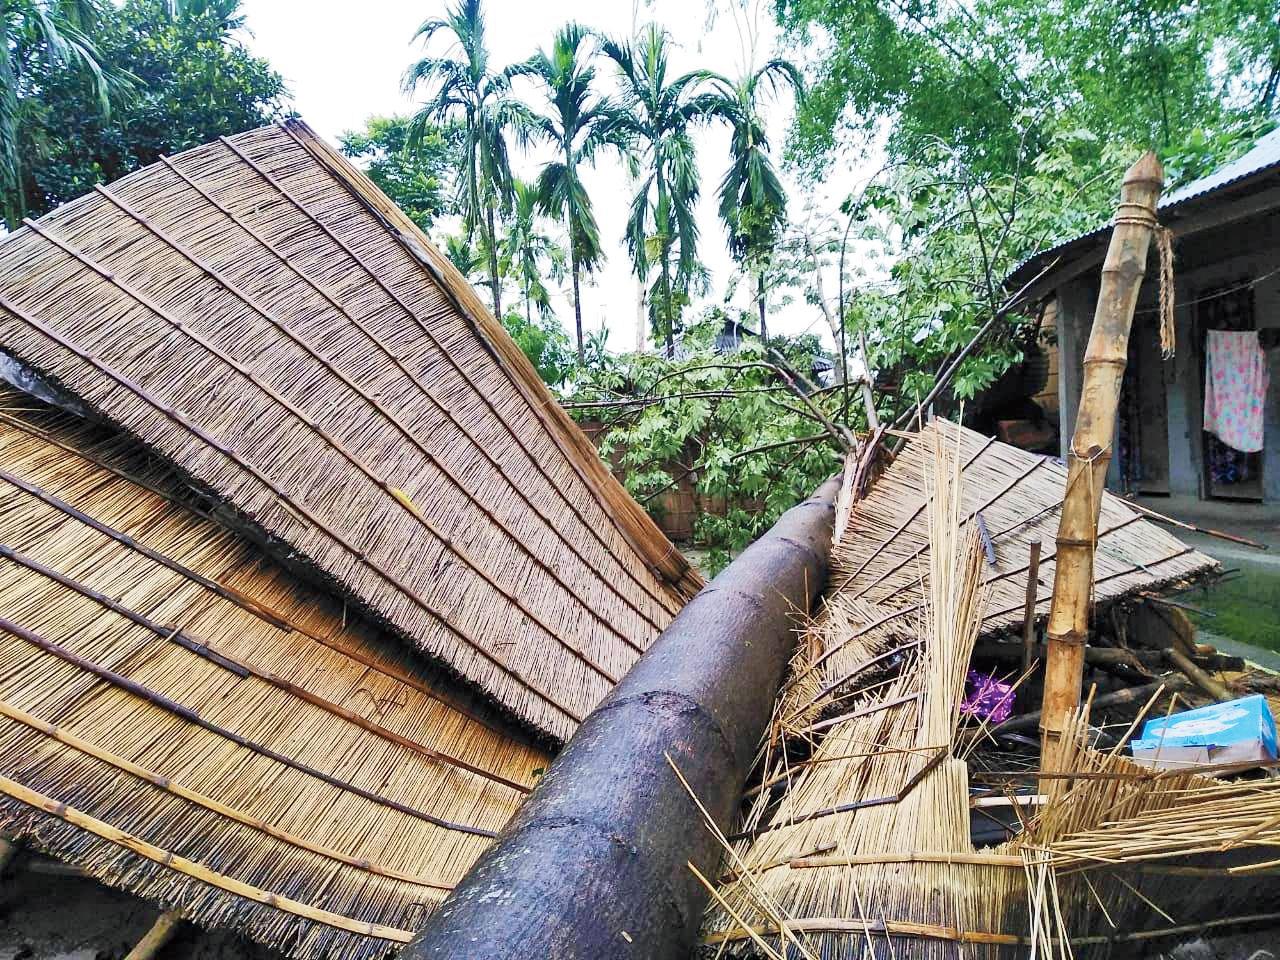 A hut damaged by a fallen tree at Kunjanagar in the Falakata block of Alipurduar district.